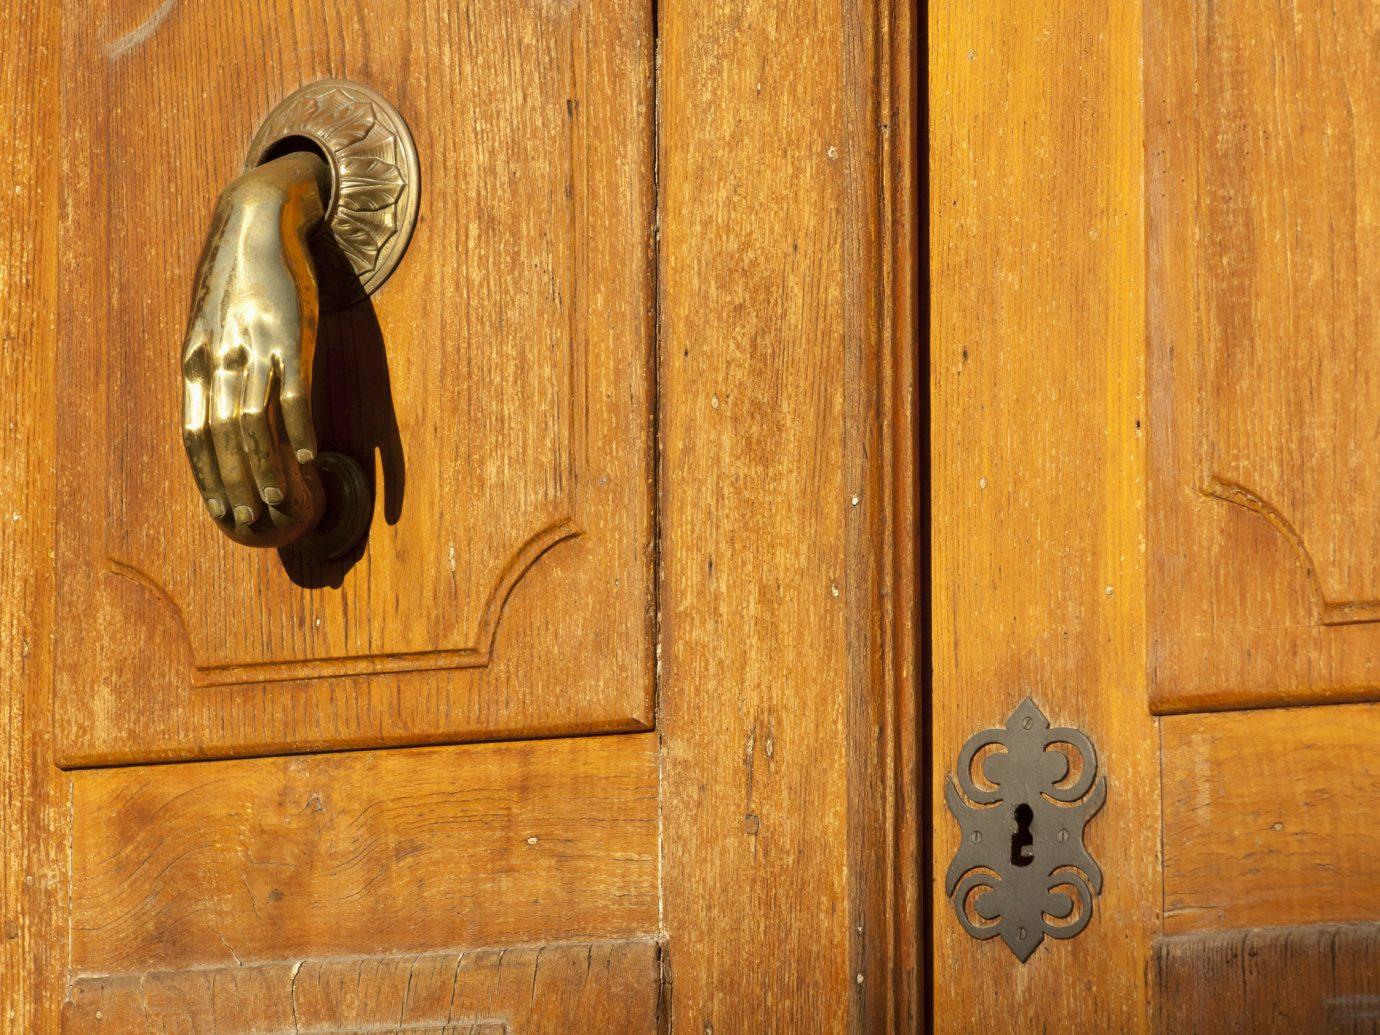 Offbeat wooden man made object wood door wall hardwood floor carving wood stain lock metalware wood flooring antique catch